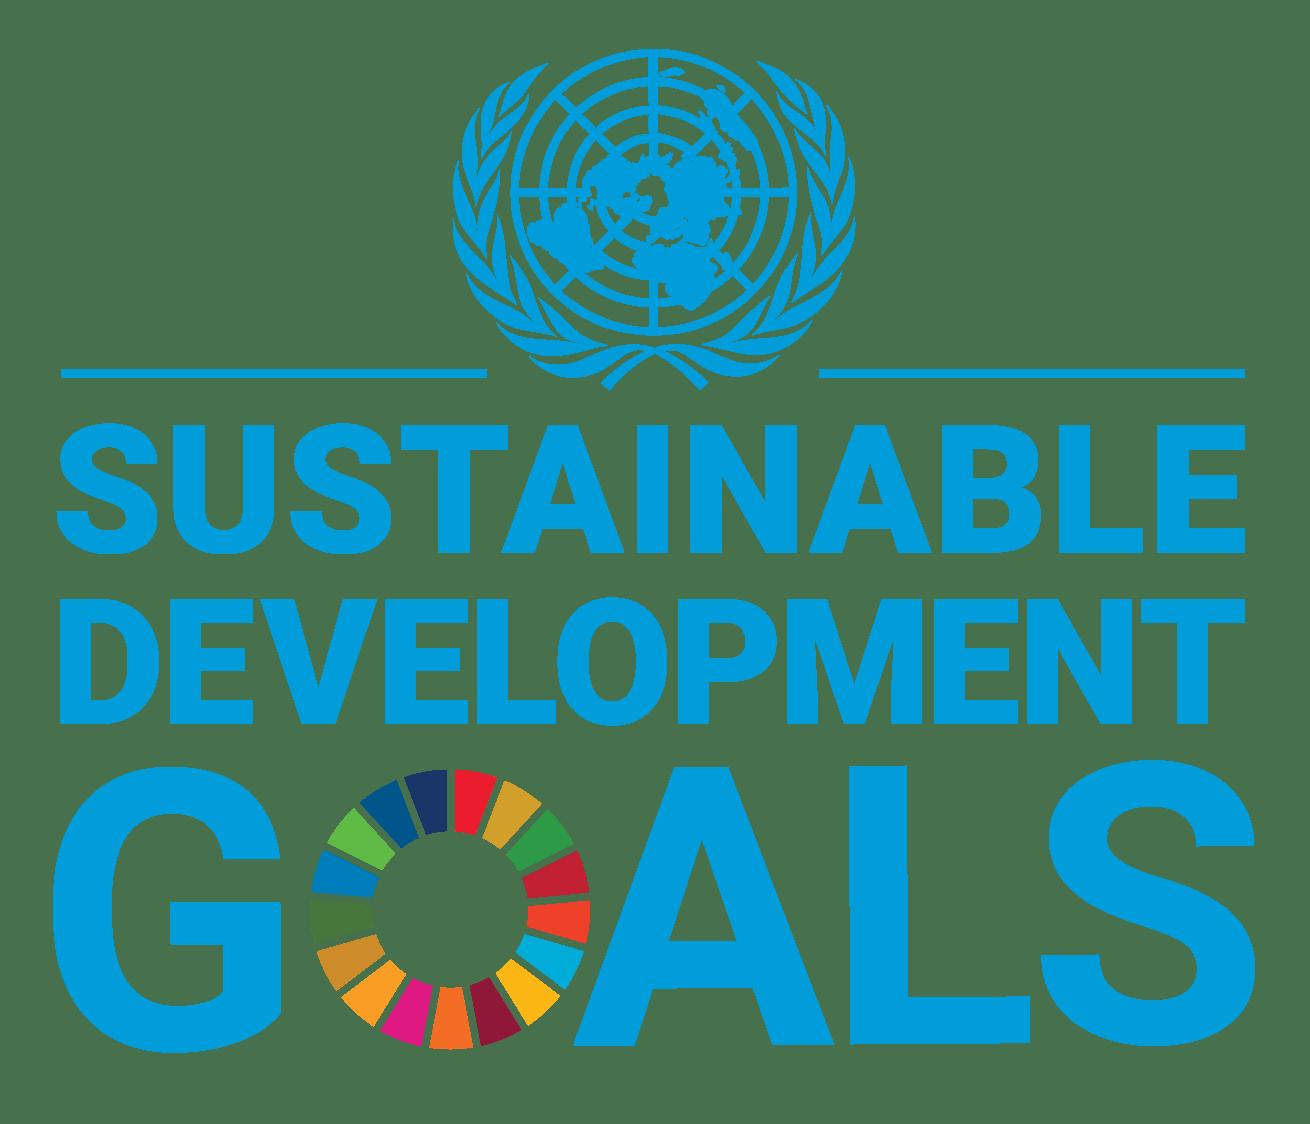 Sustainable Development Goals United Nations logo